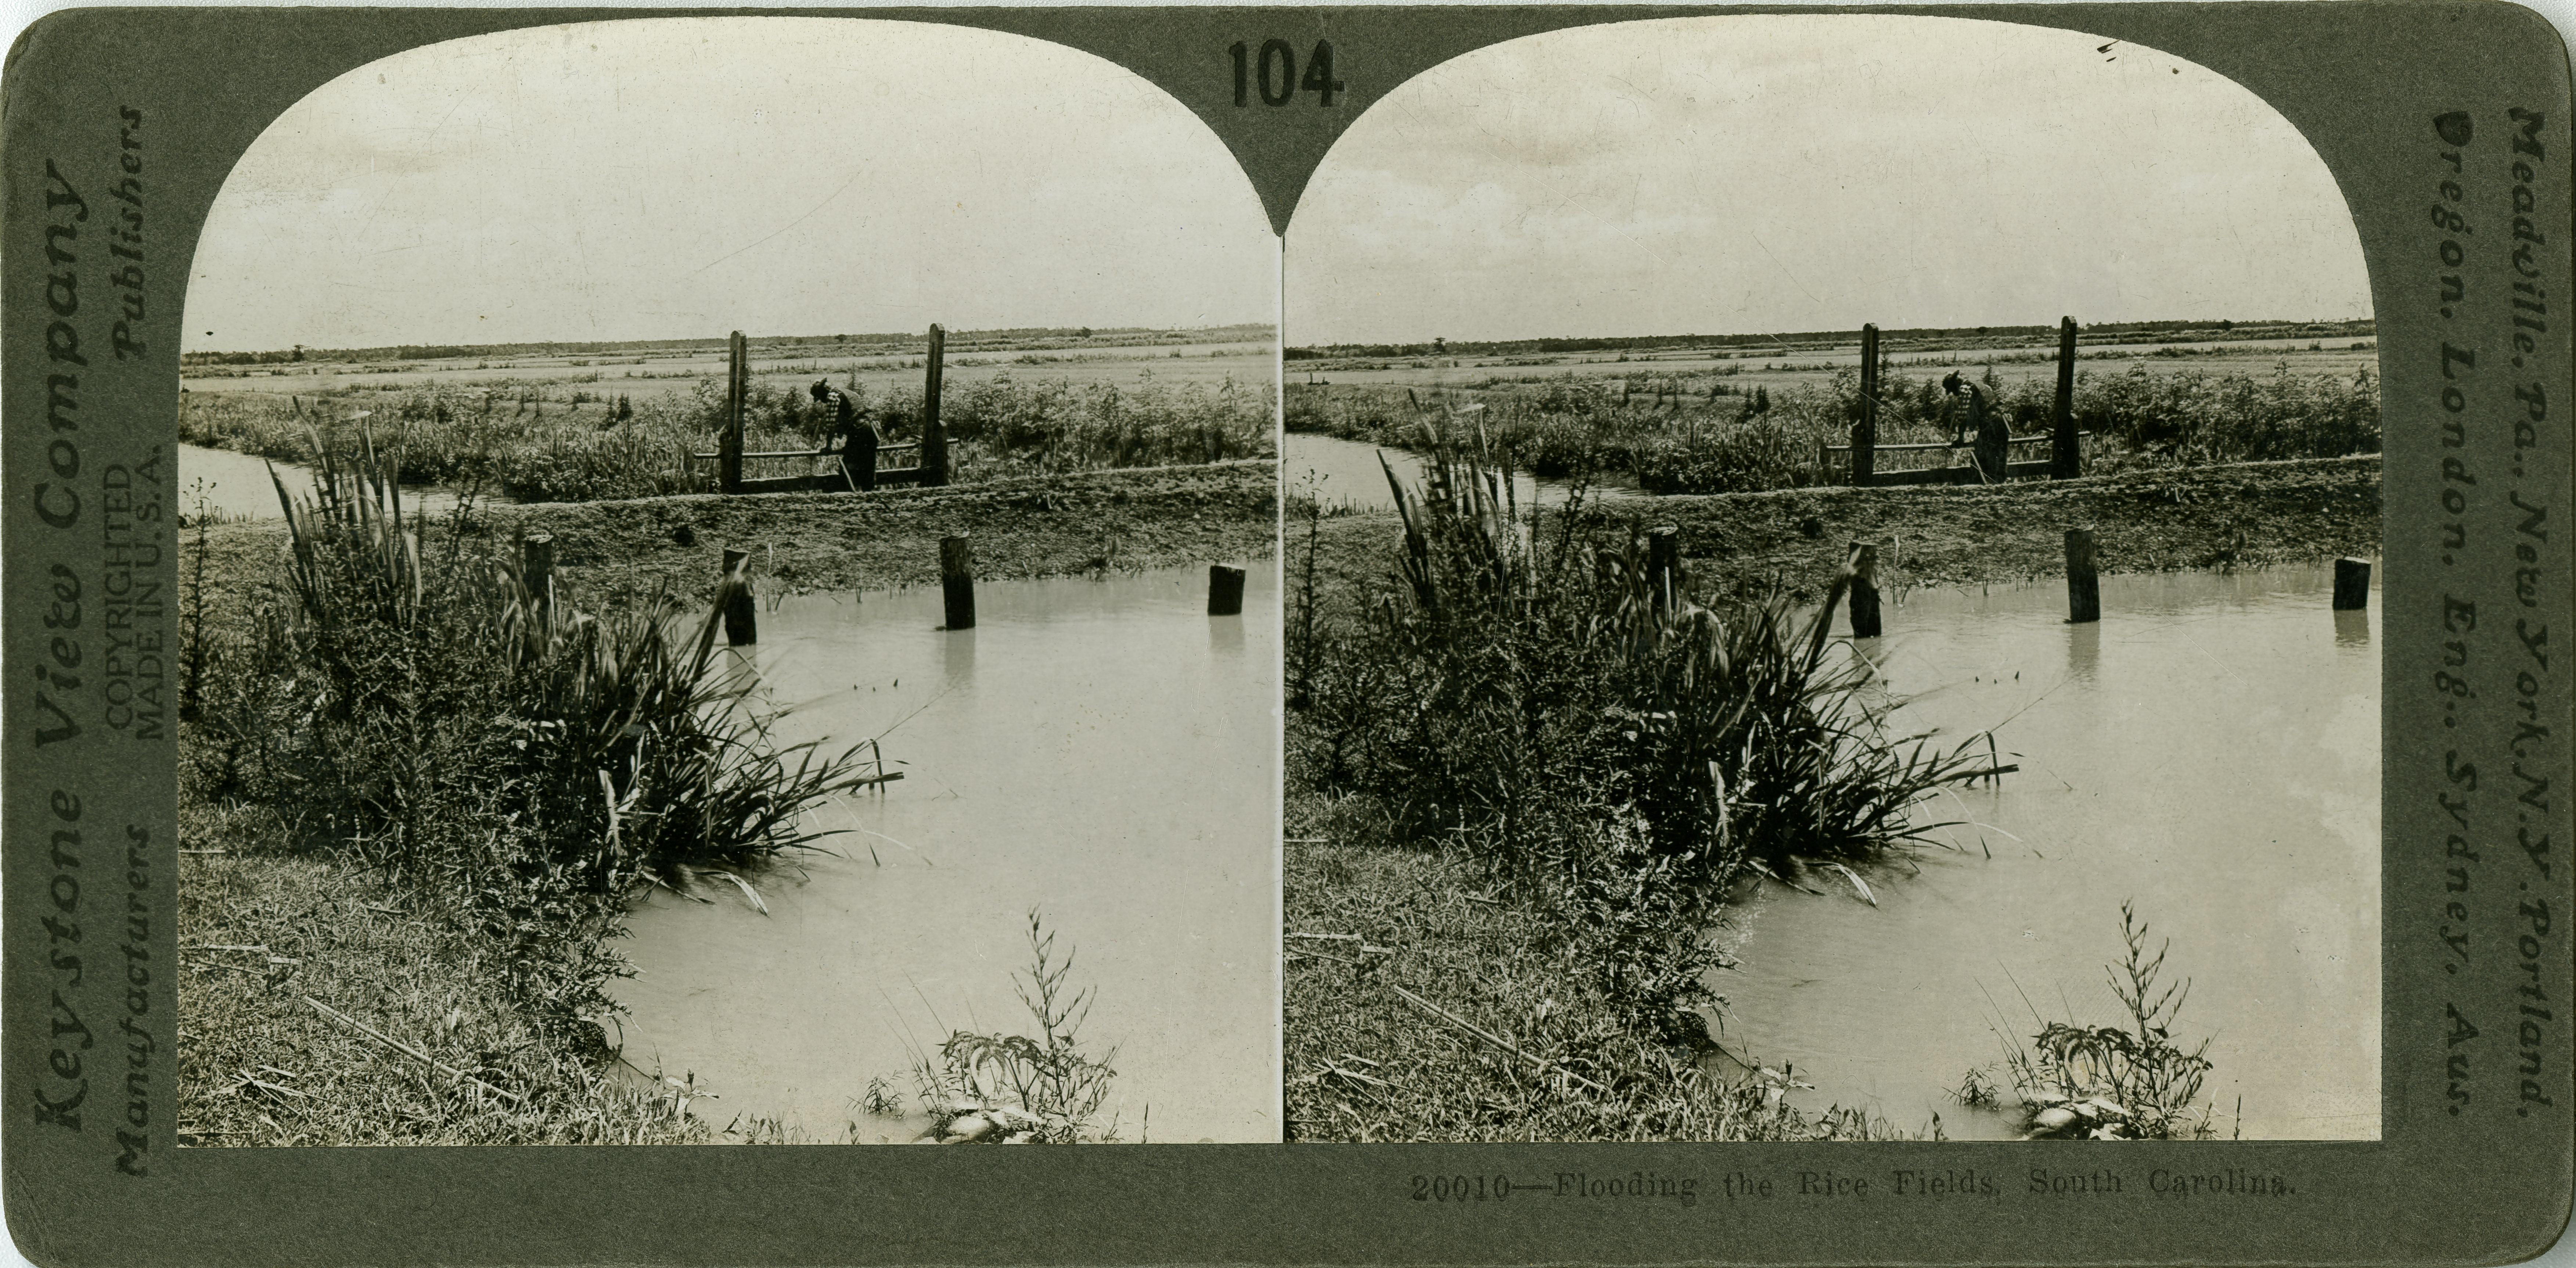 Flooding the rice fields, South Carolina